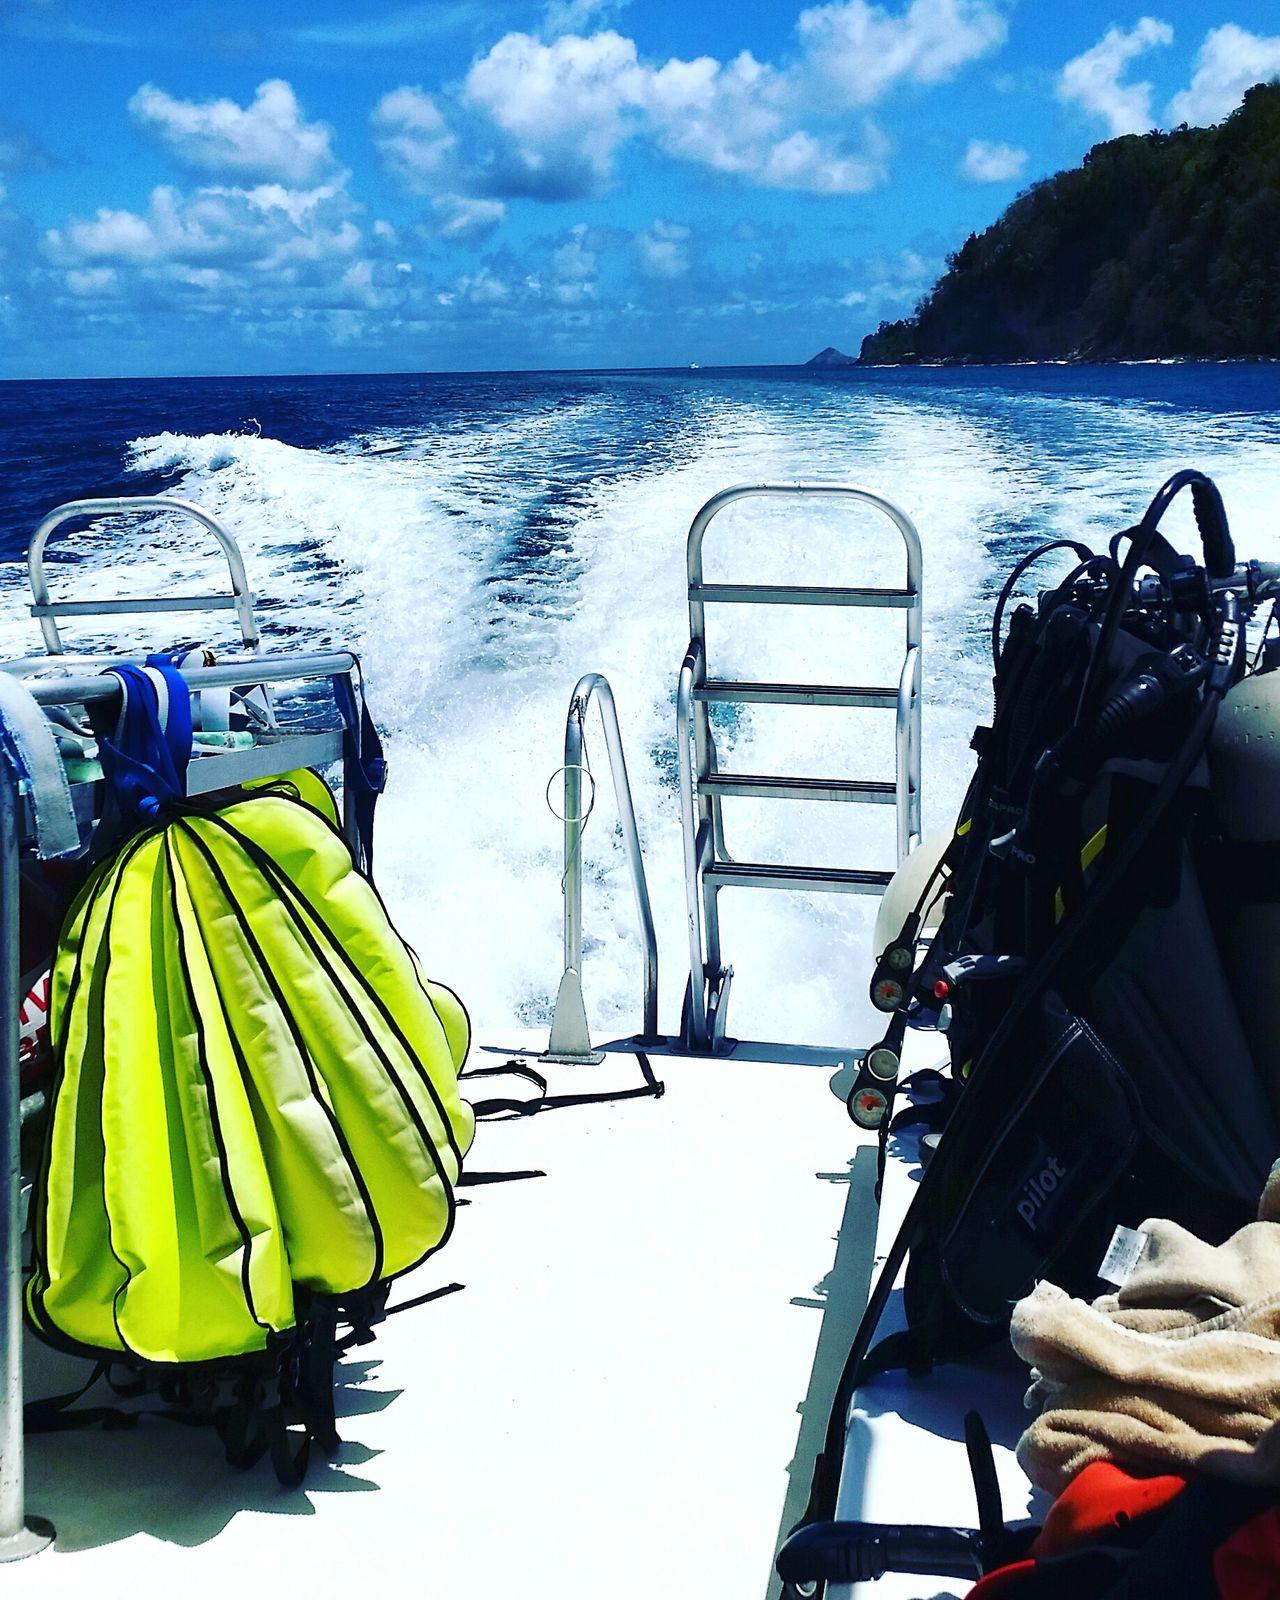 My Year My View SCUBA Scuba Tanks Scubadiving Scuba Diver Scubadive Caribbean Sandalsresorts St. Lucia Sea Water Outdoors Sky Day Scuba Diving